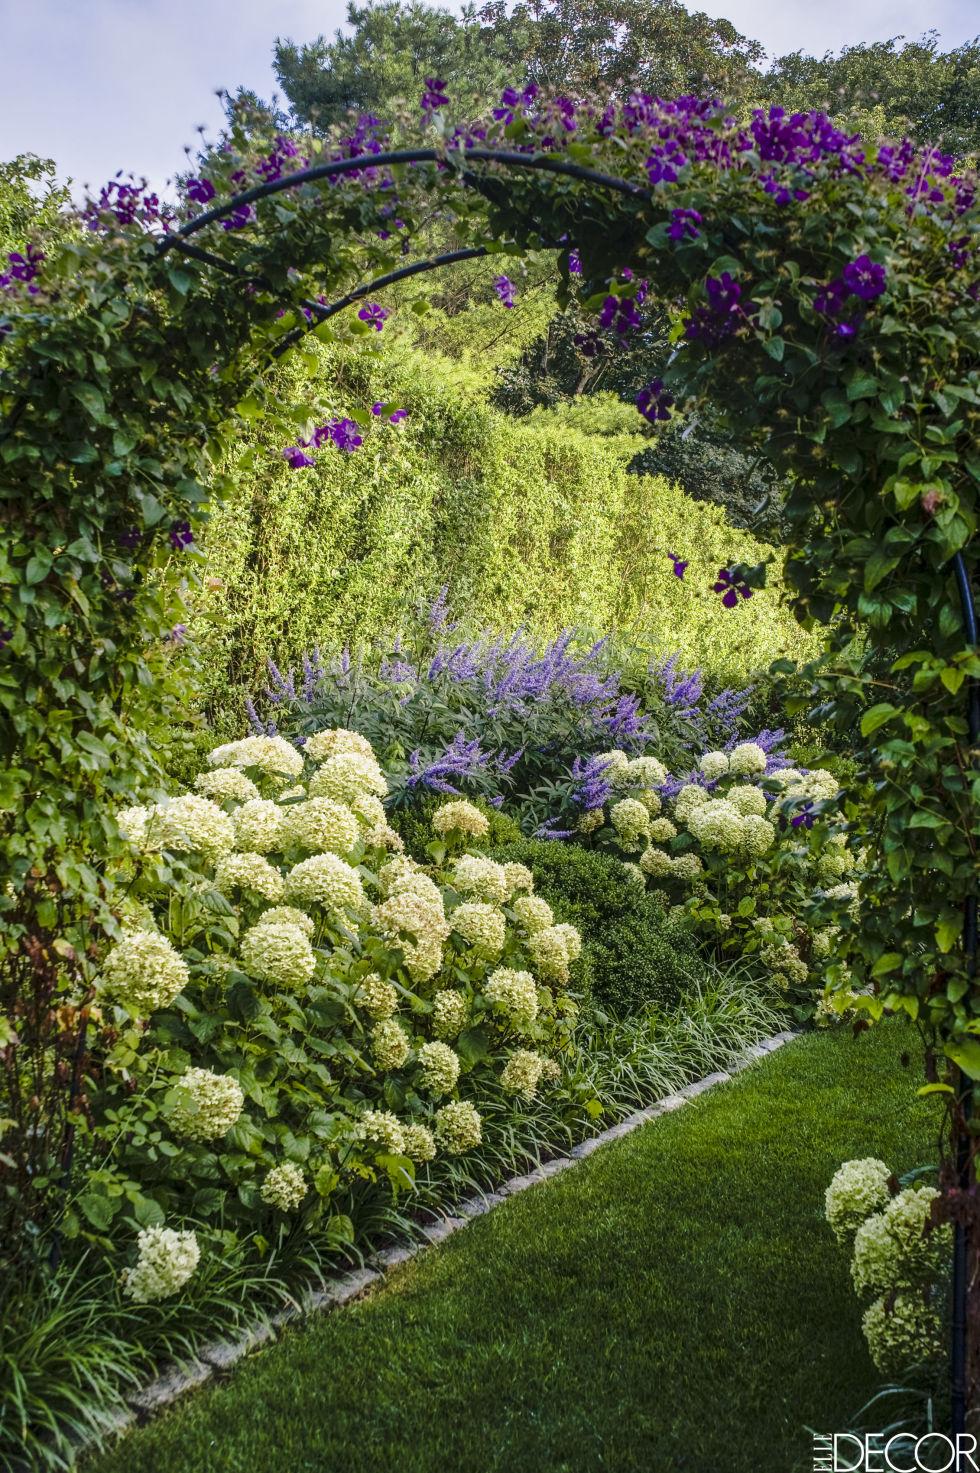 gallery-1468335289-ina-garten-garden-2.jpg